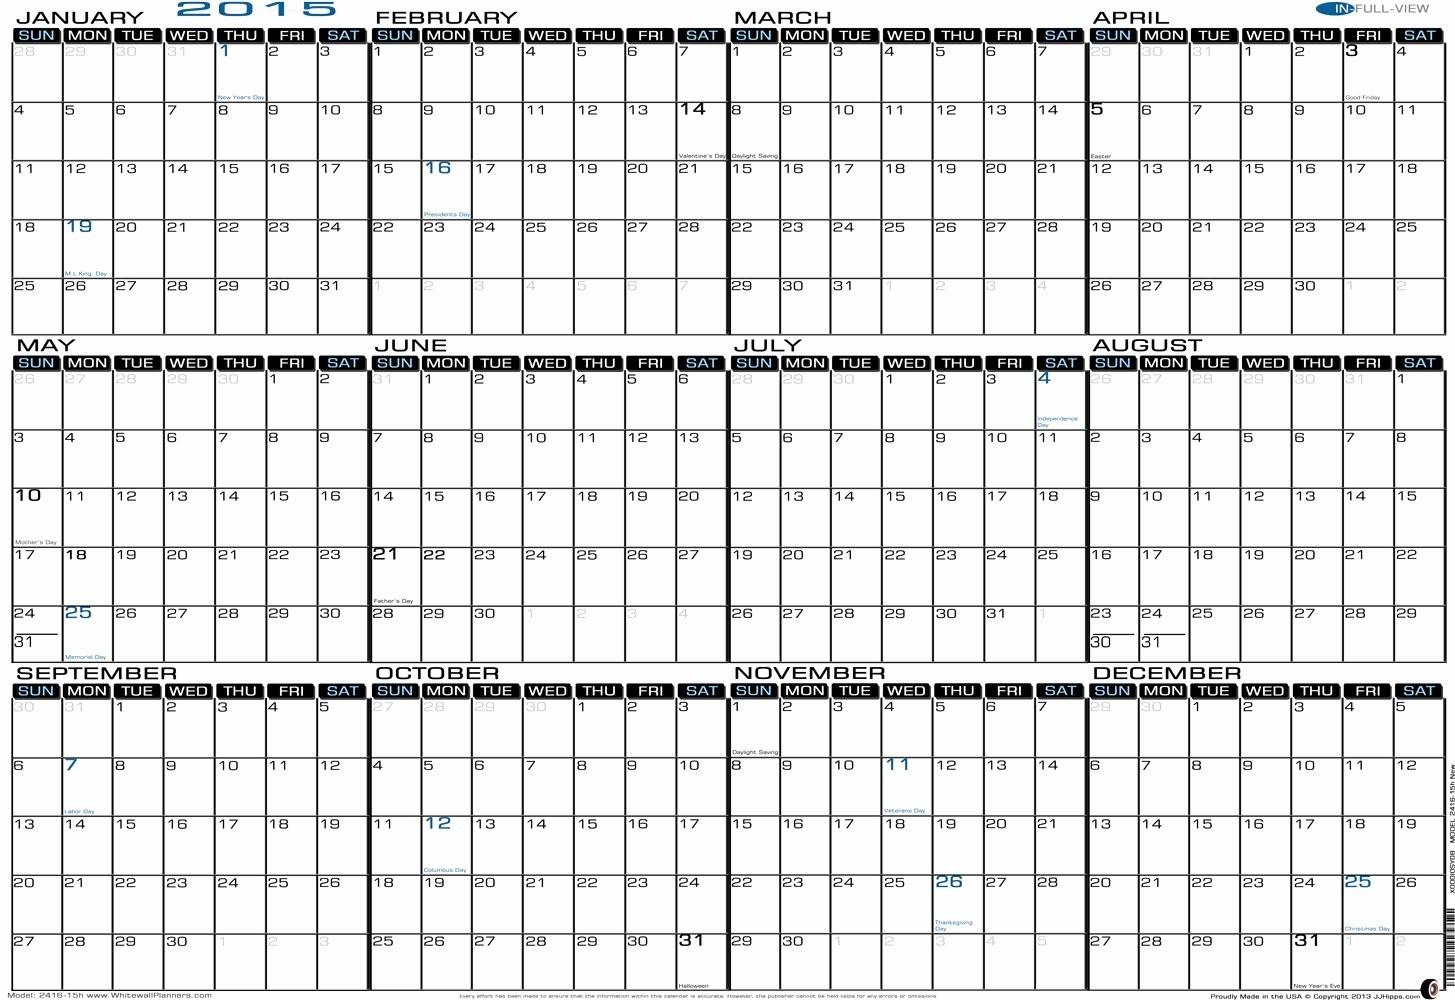 Free Printable Annual Calendar 2017 Luxury Free Printable Yearly Calendar 2015 – 2017 Printable Calendar